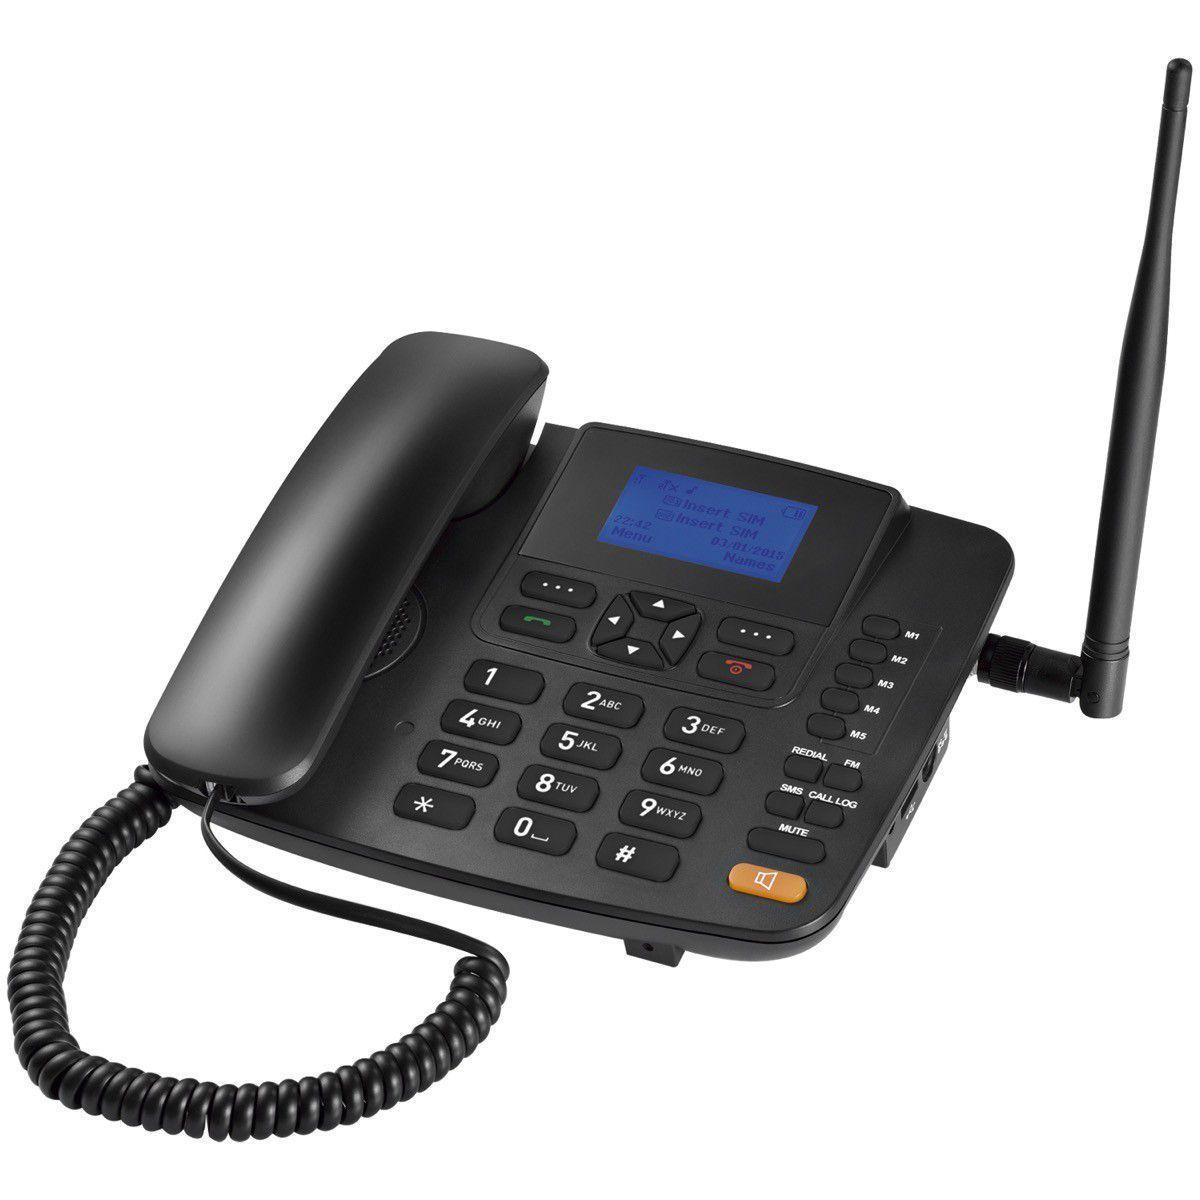 Telefone Celular Rural Gsm C/Fio Dual Chip Multilaser